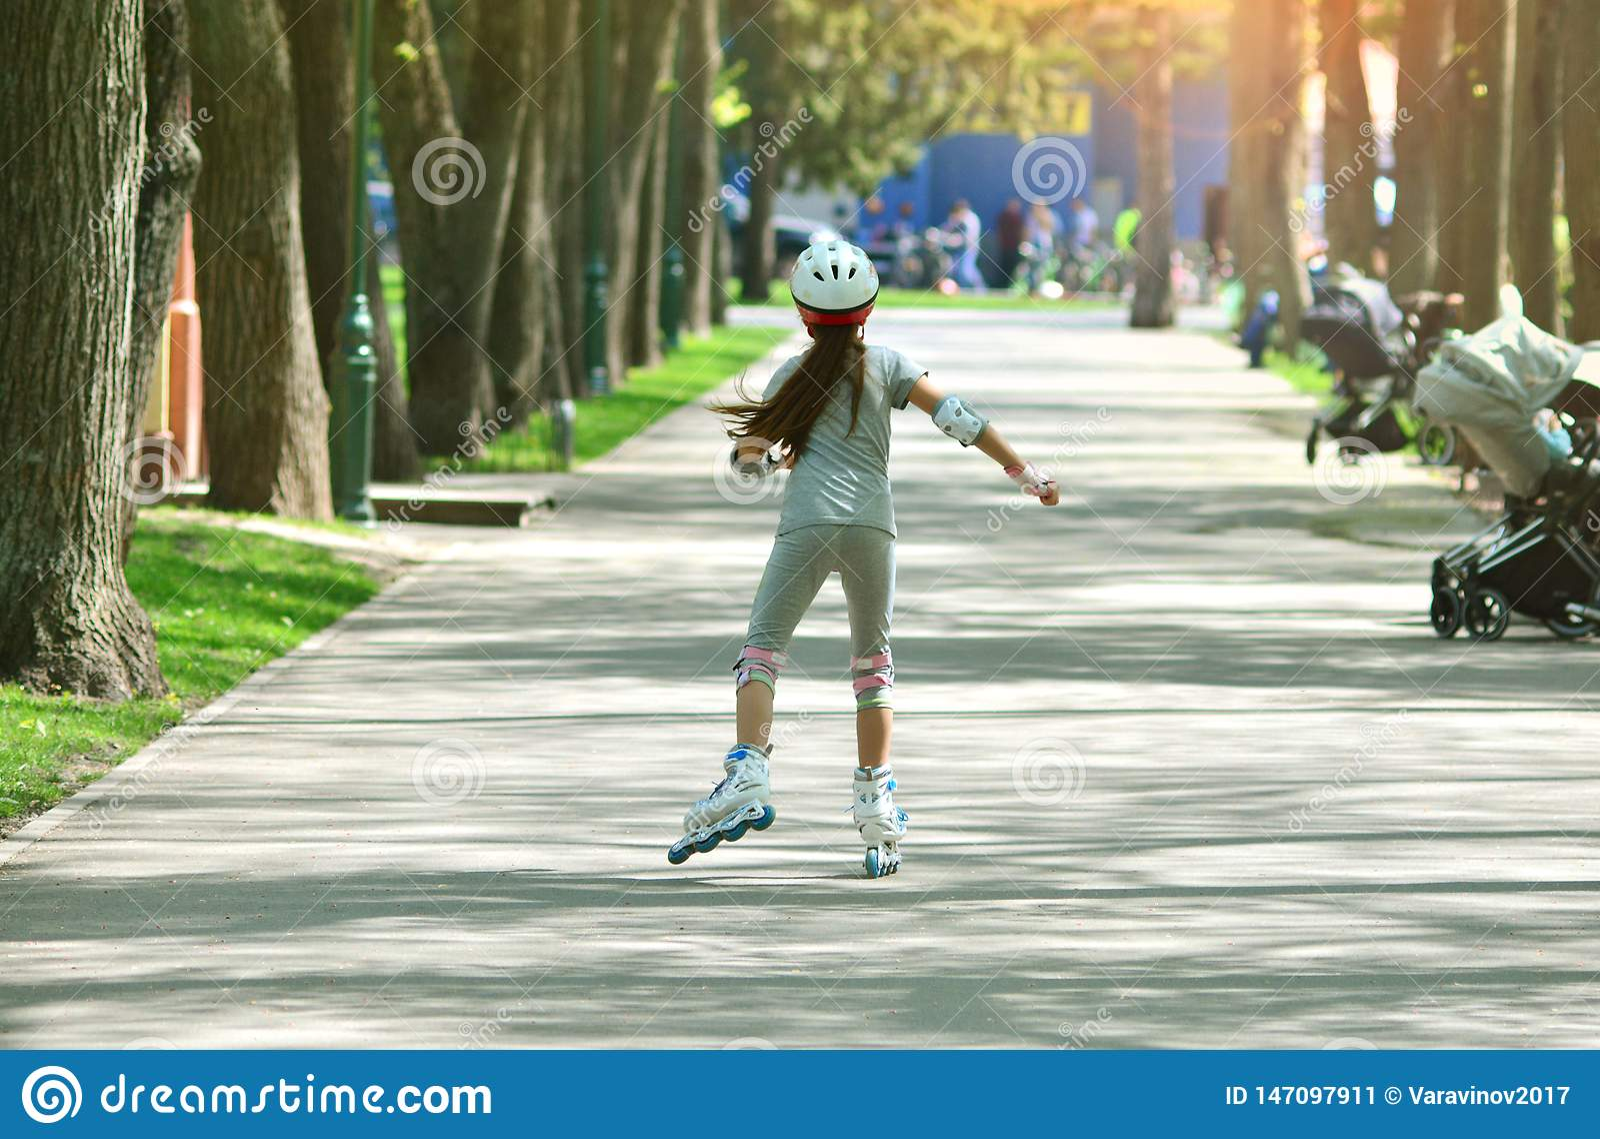 Roller girl children on a park alley